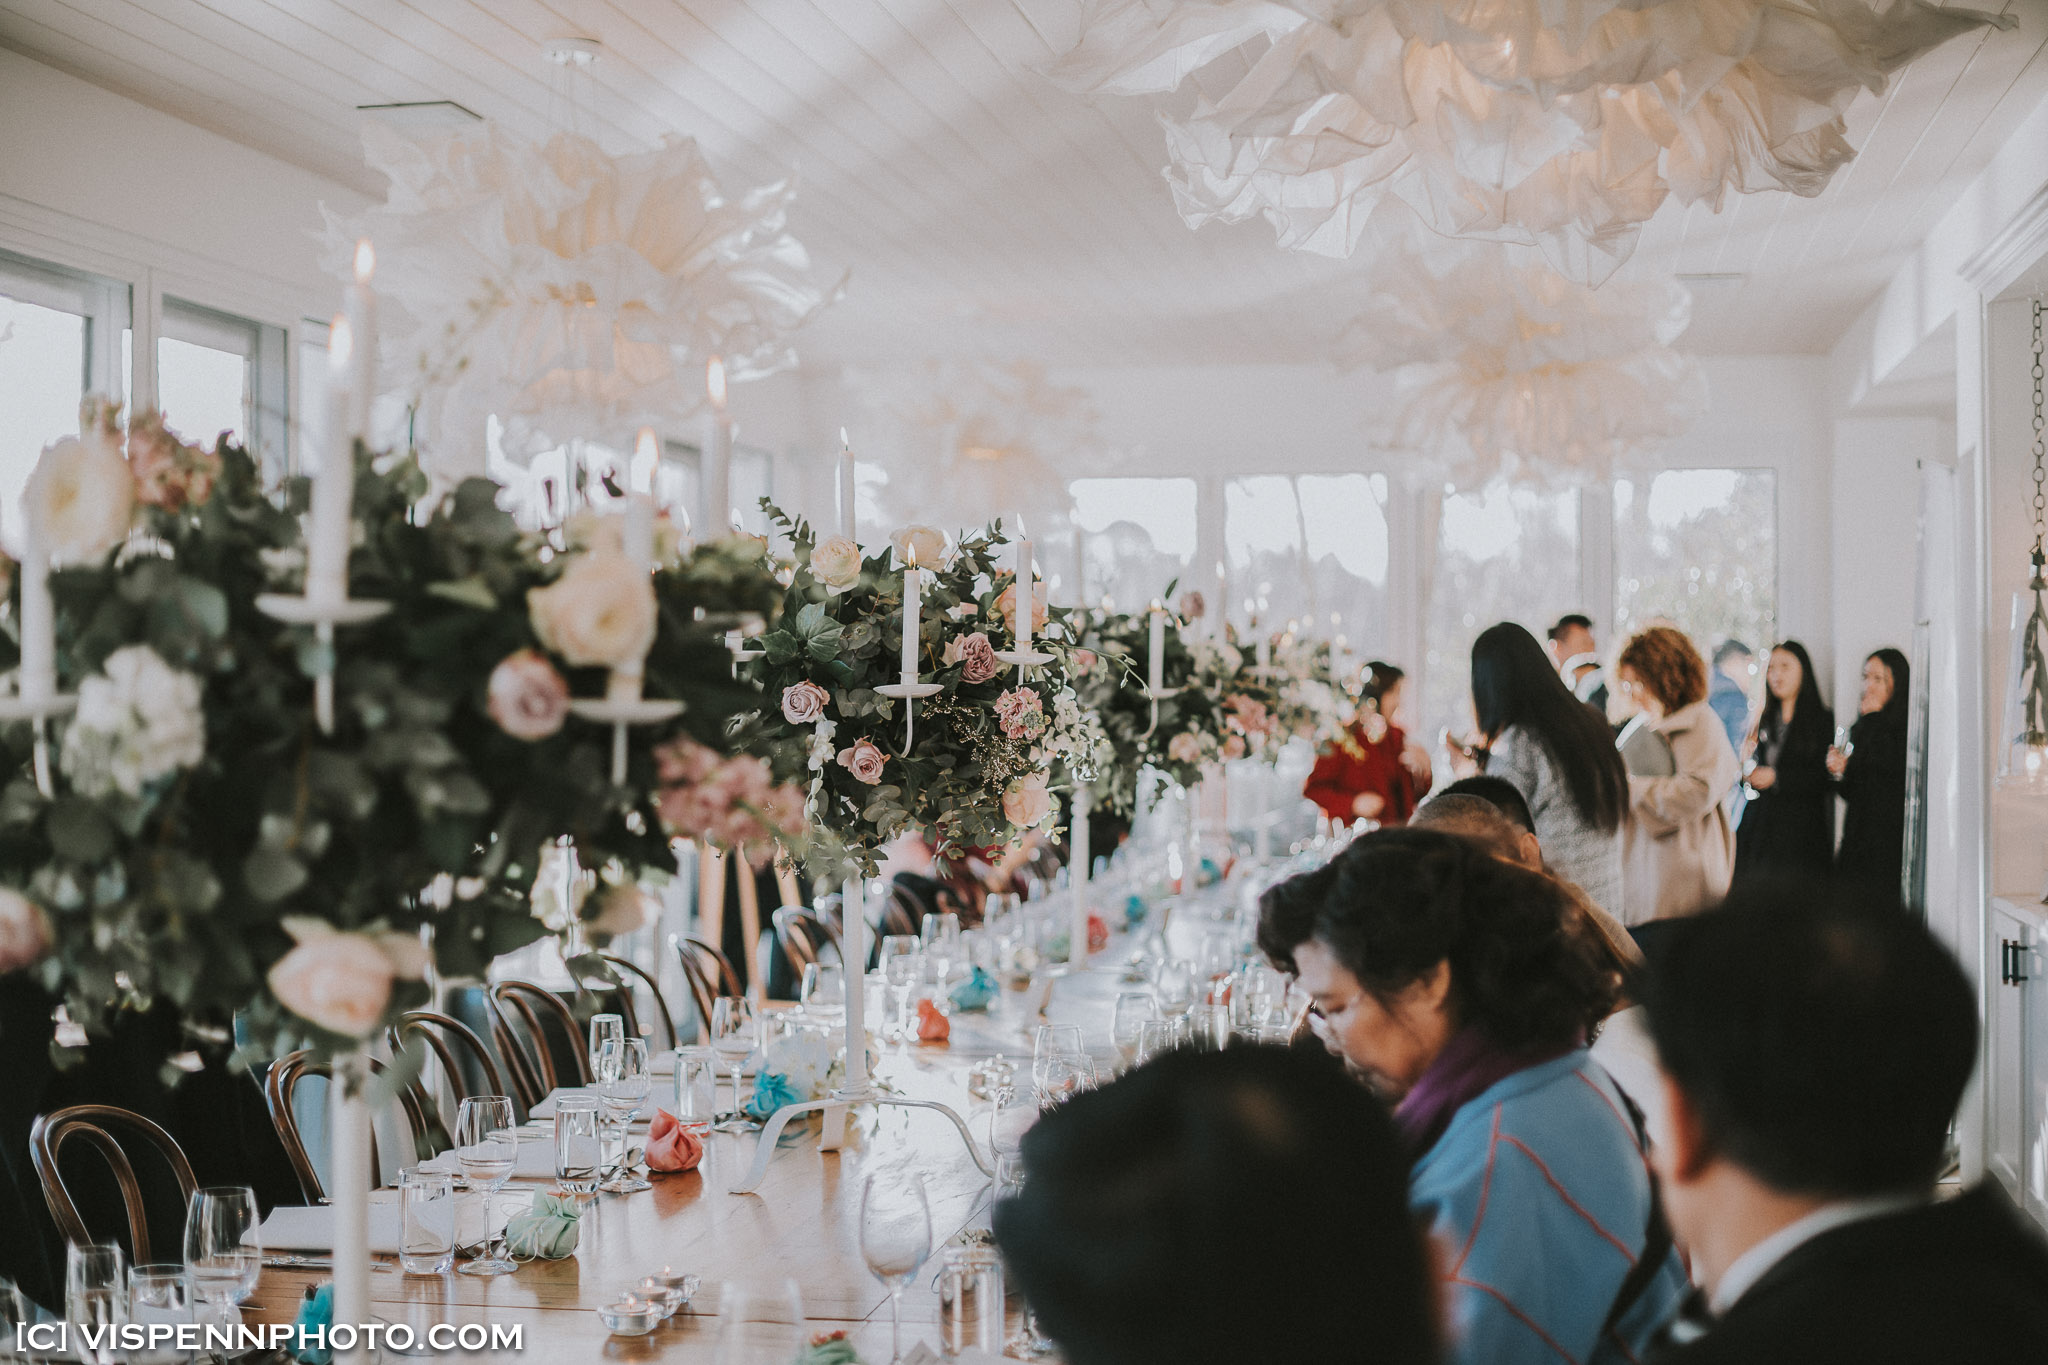 WEDDING DAY Photography Melbourne ZHPENN 5D4 1198